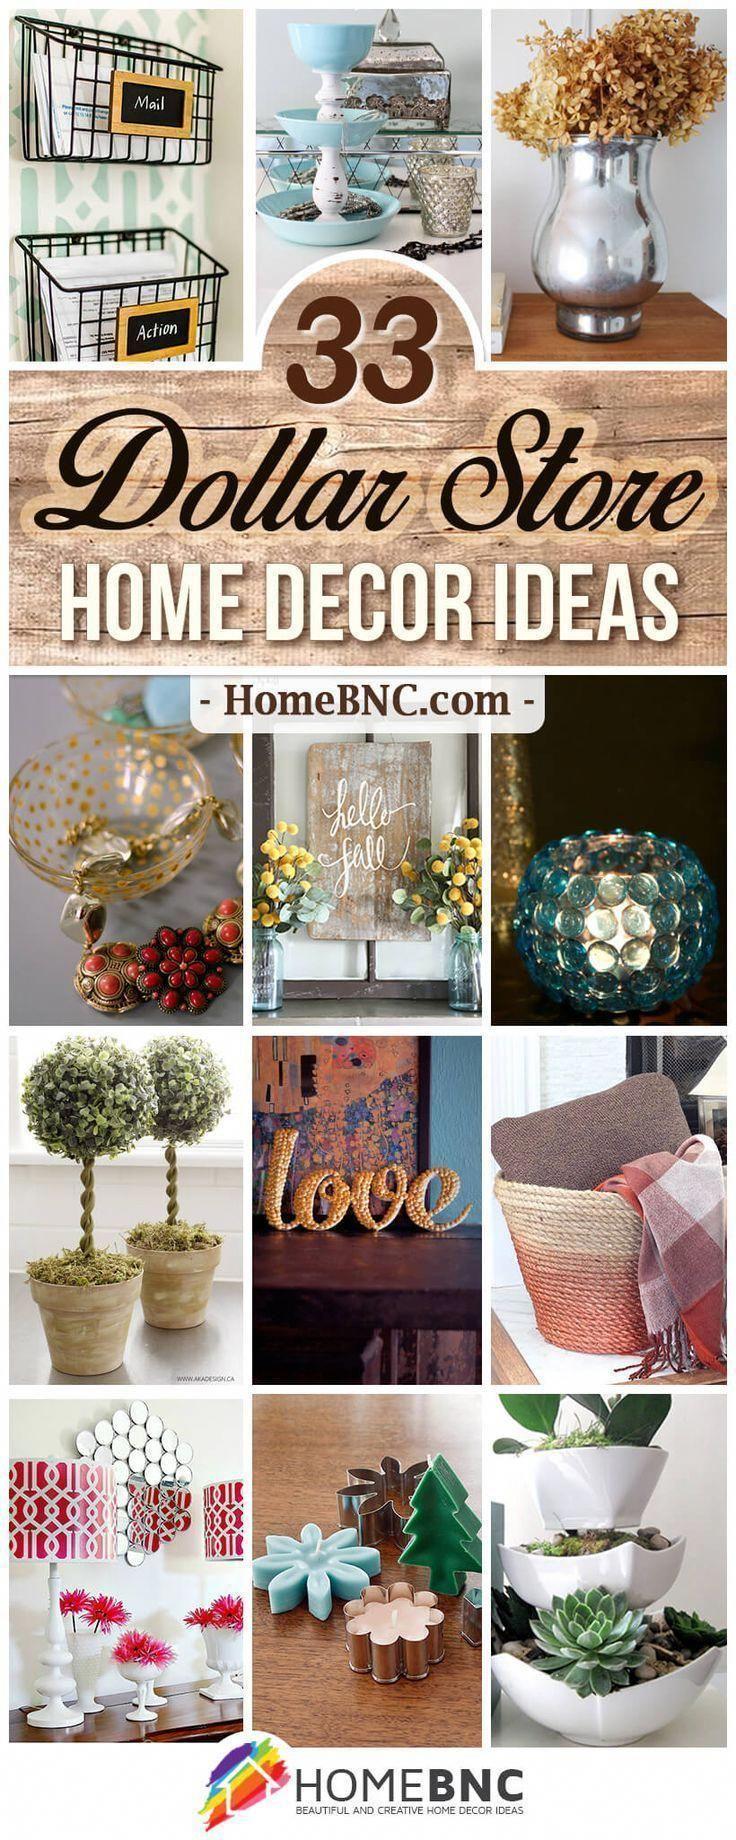 DIY Dollar Store Home Decor Ideas #homedecor